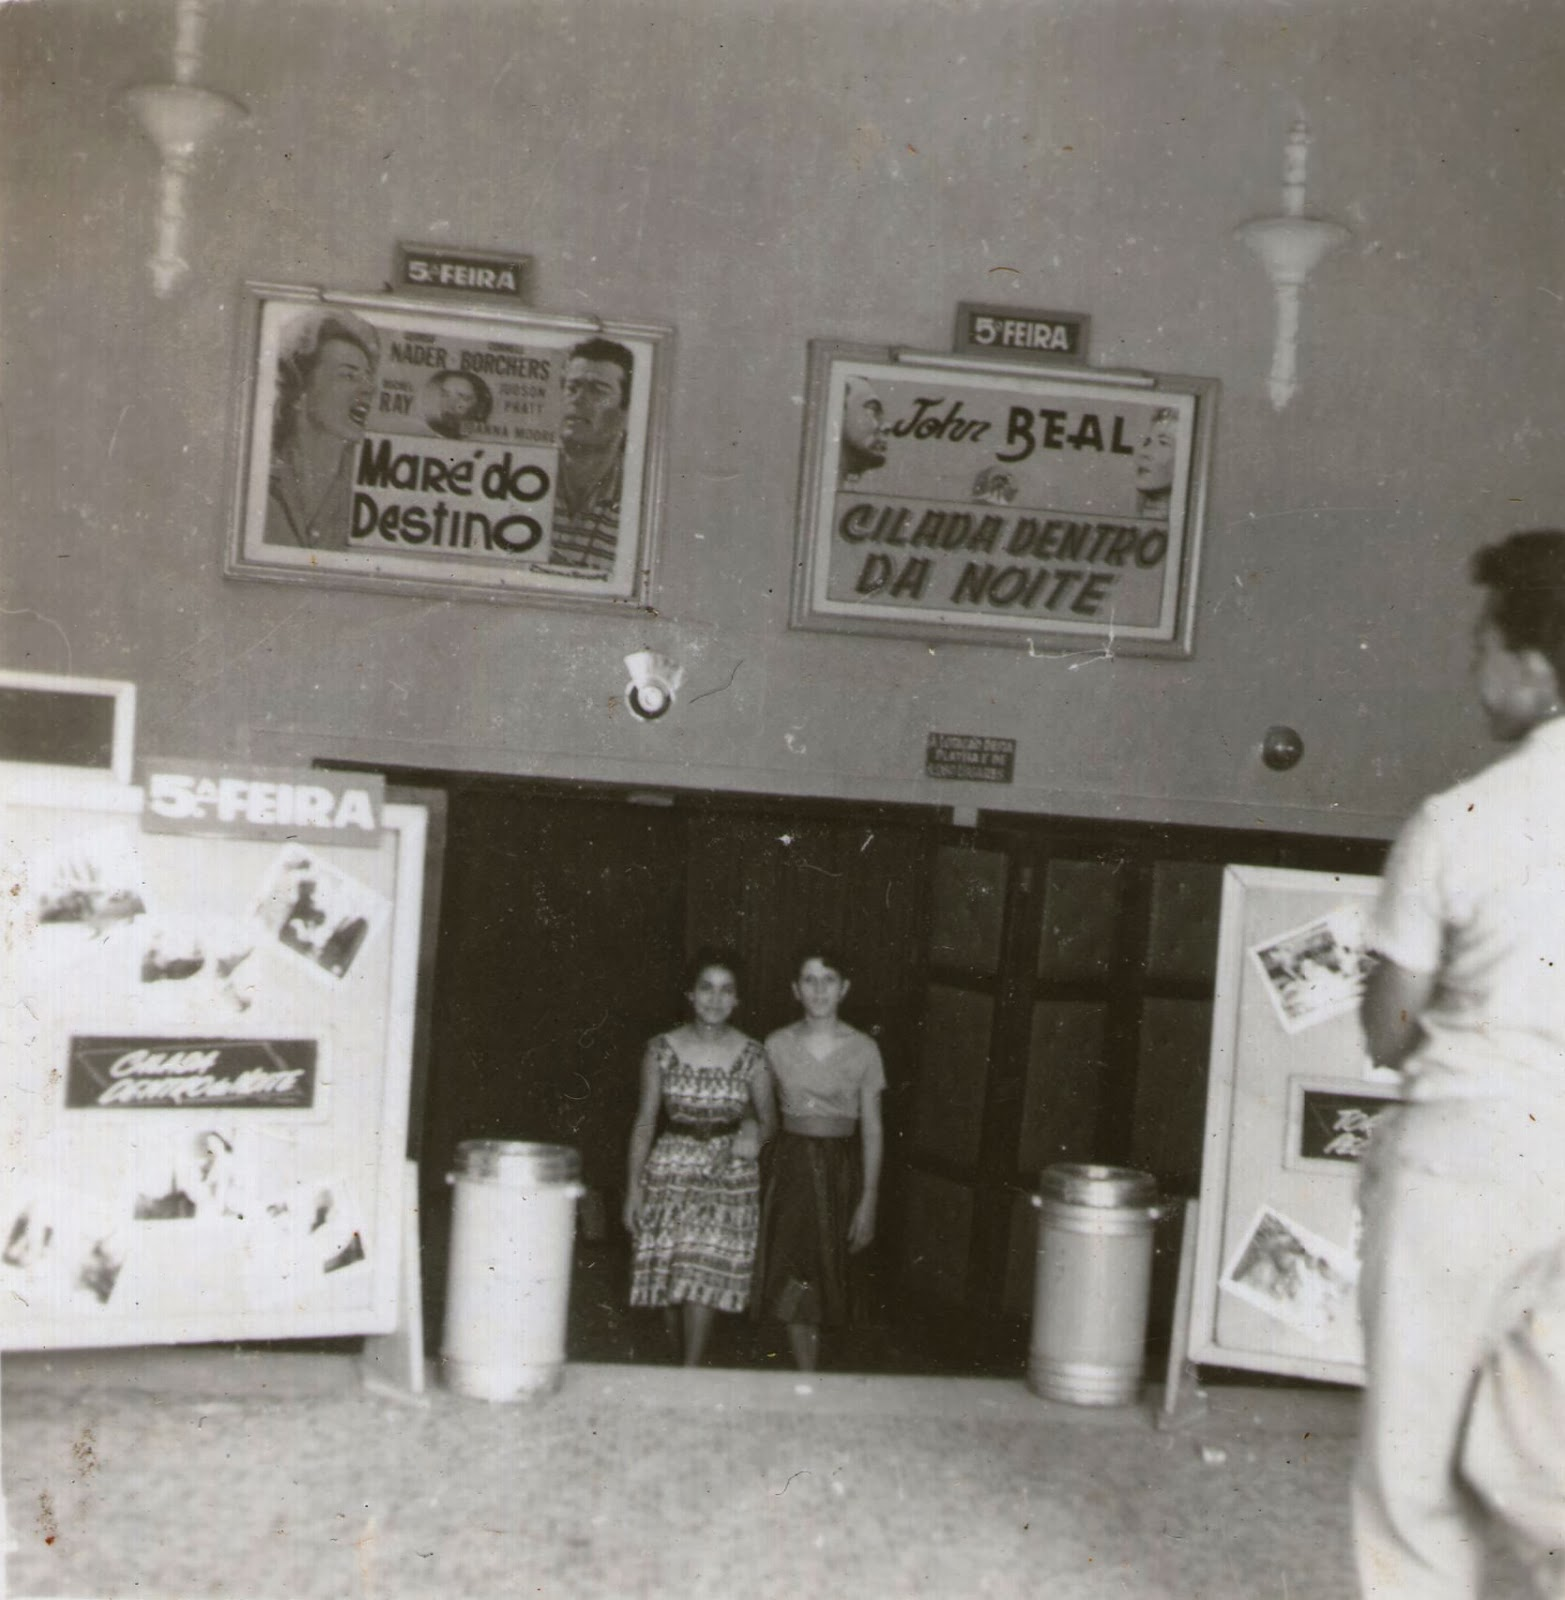 Vila Santa Isabel, Rogério de Moura, cinemas antigos, salas de cinema, Zona Leste de São Paulo, Vila Formosa, Vila Carrão